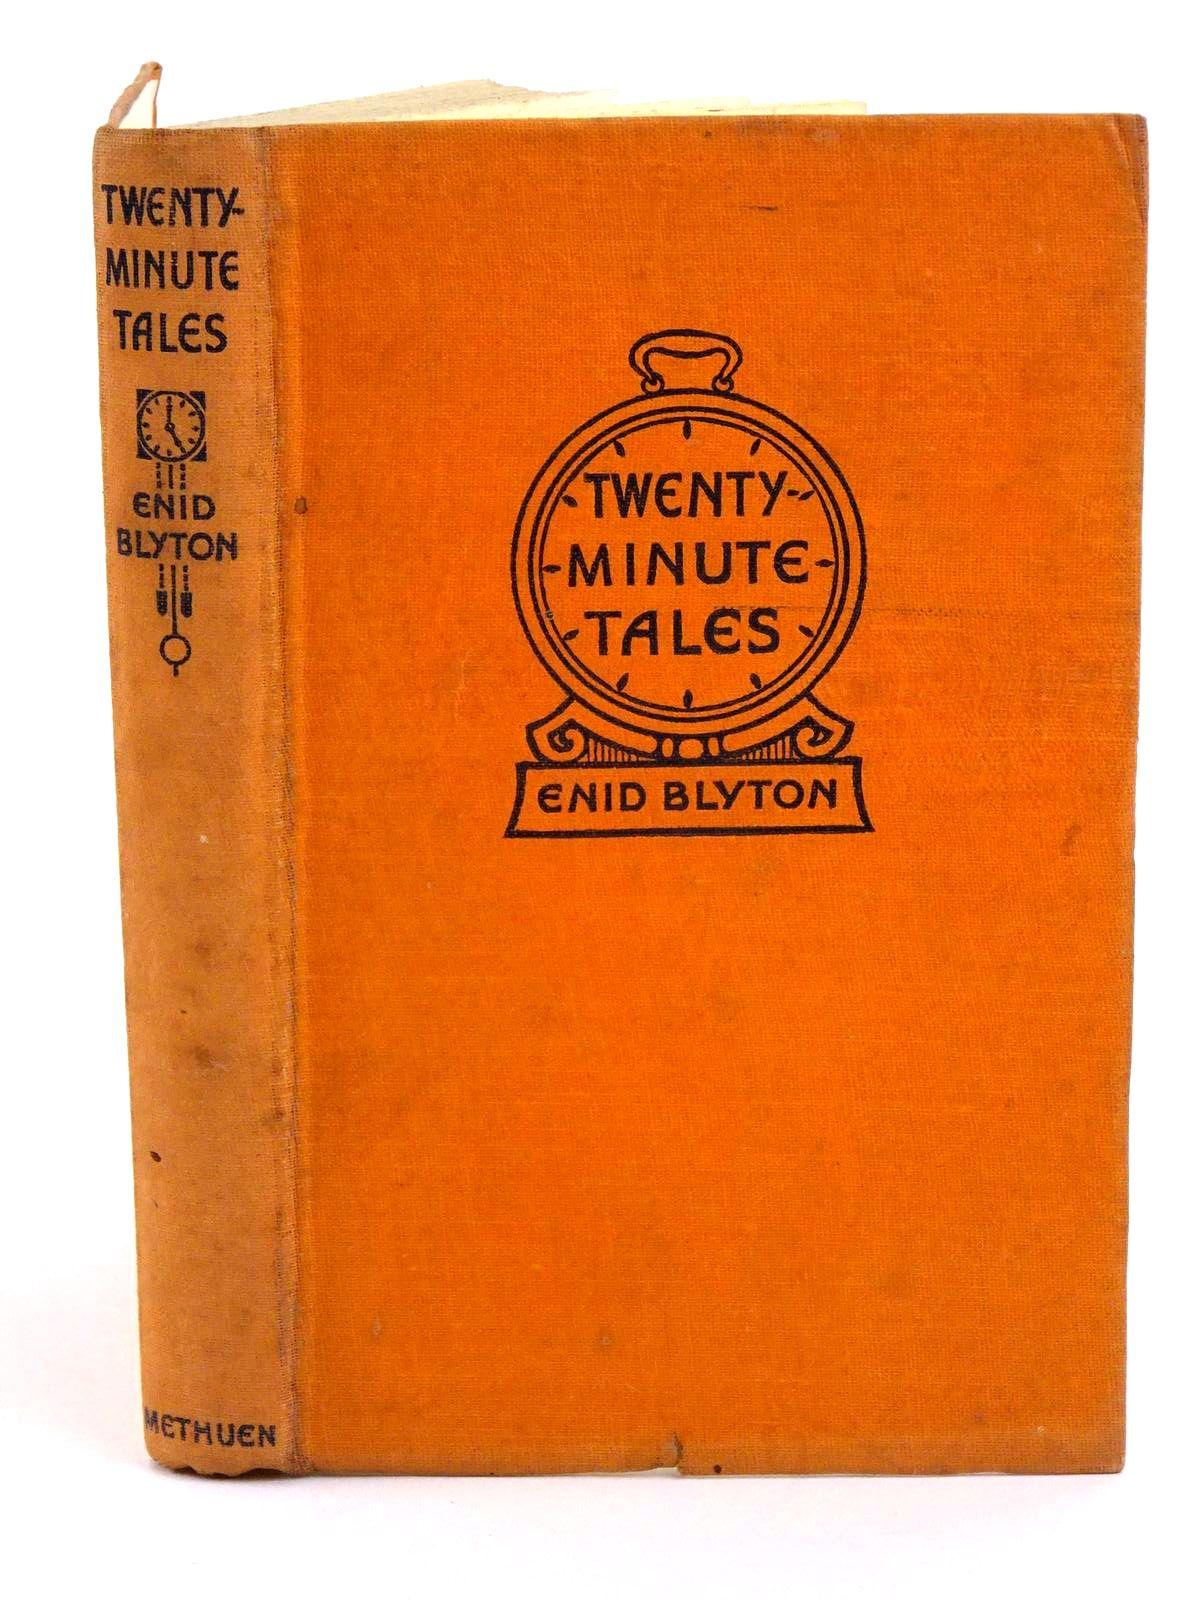 Photo of TWENTY-MINUTE TALES written by Blyton, Enid published by Methuen & Co. Ltd. (STOCK CODE: 1318213)  for sale by Stella & Rose's Books